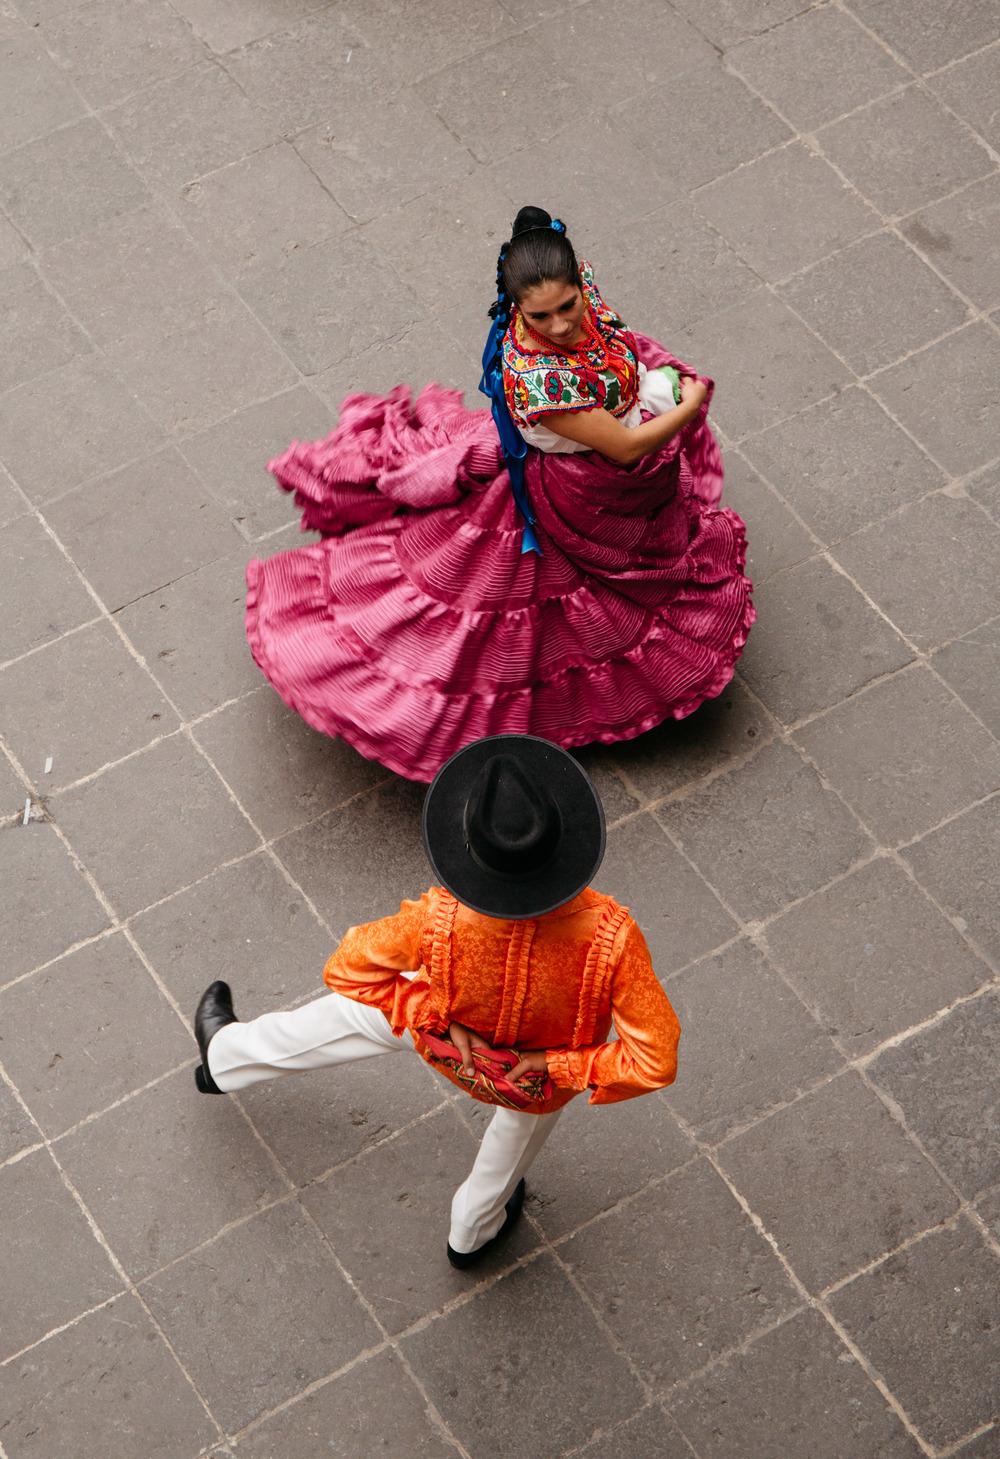 Mexico_2015-8.jpg